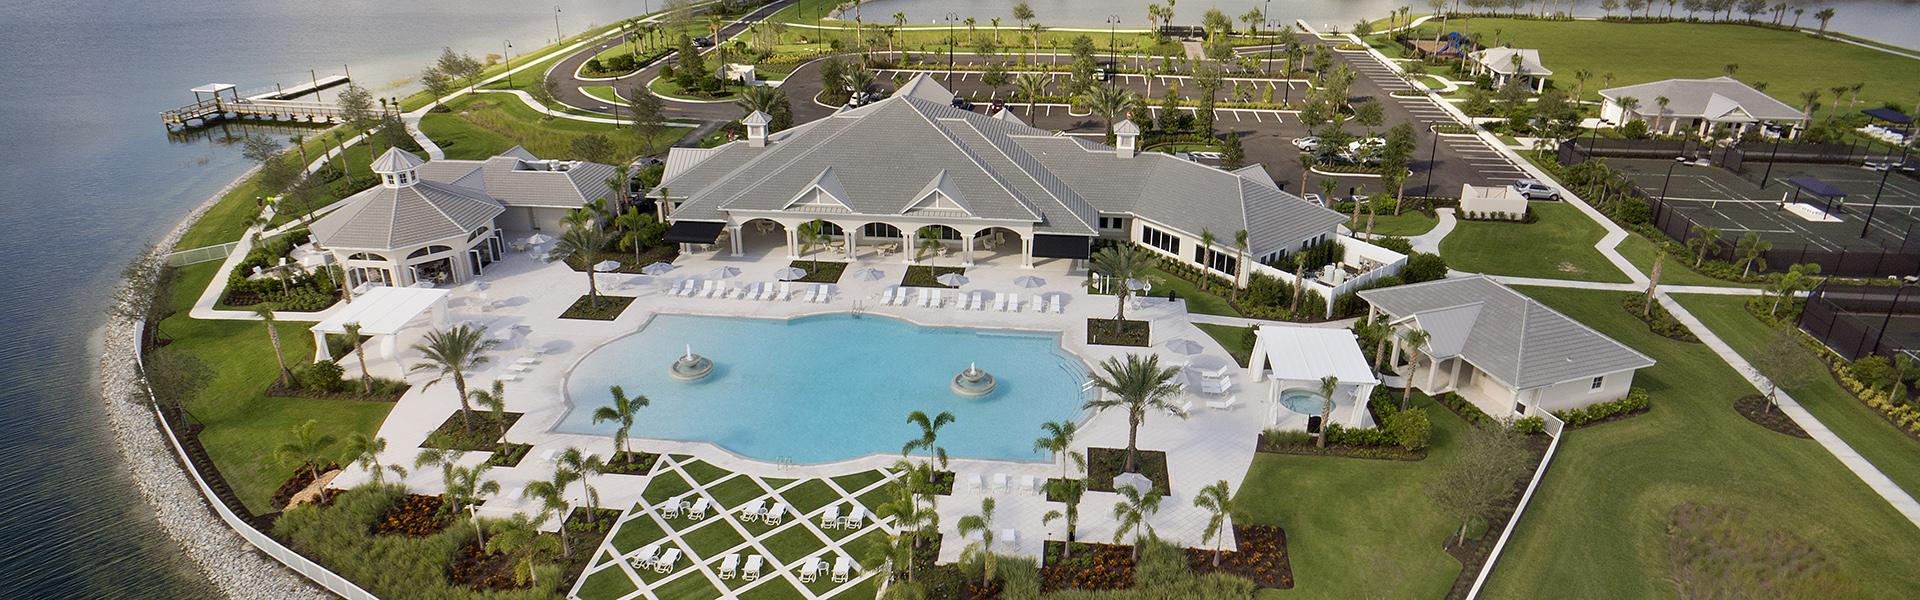 3-Club House Aerial